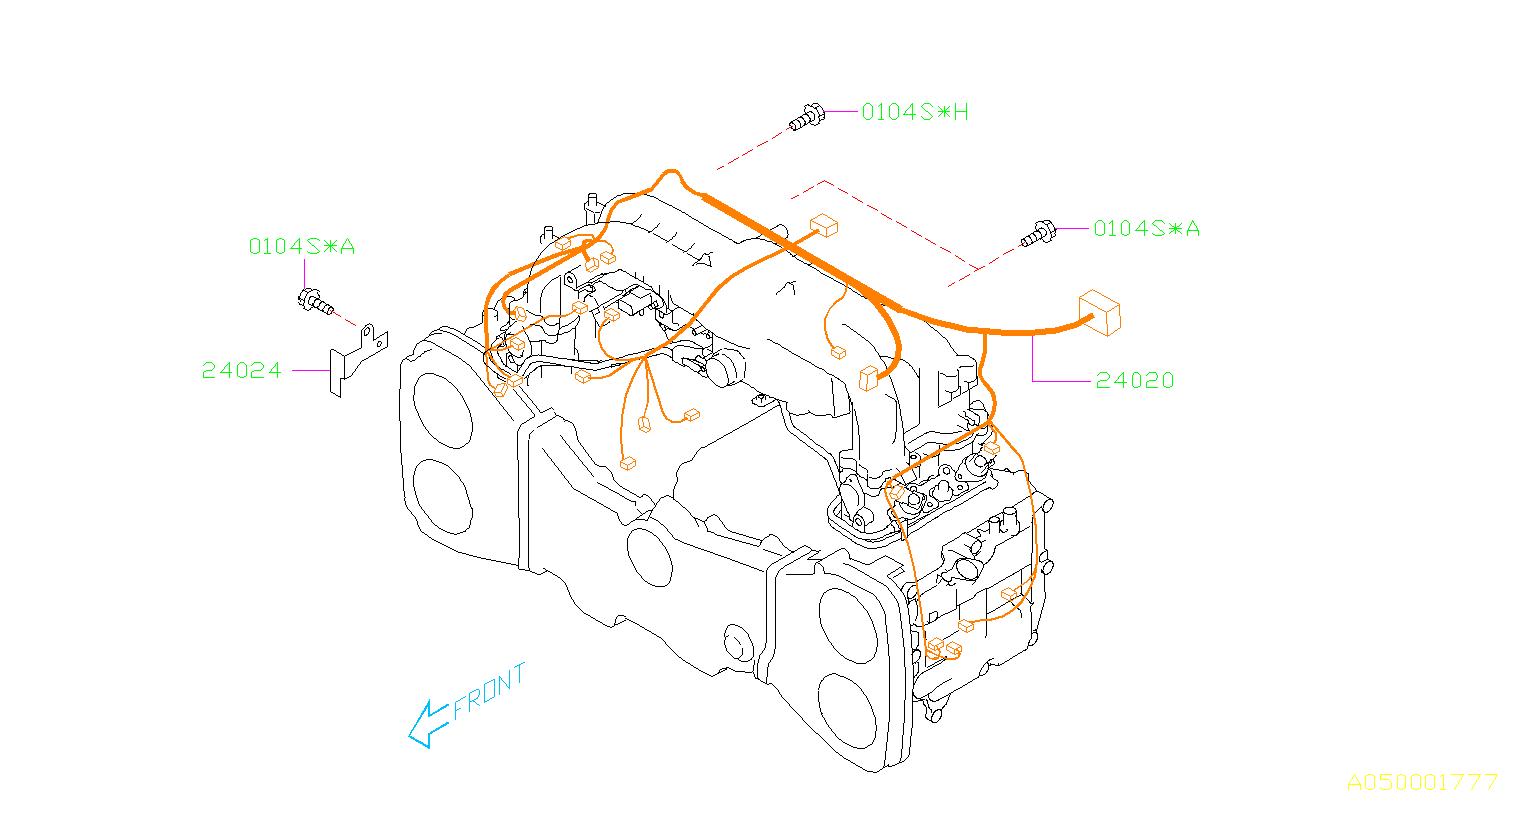 2010 Subaru Forester Engine Wiring Harness. Wiring harness ...